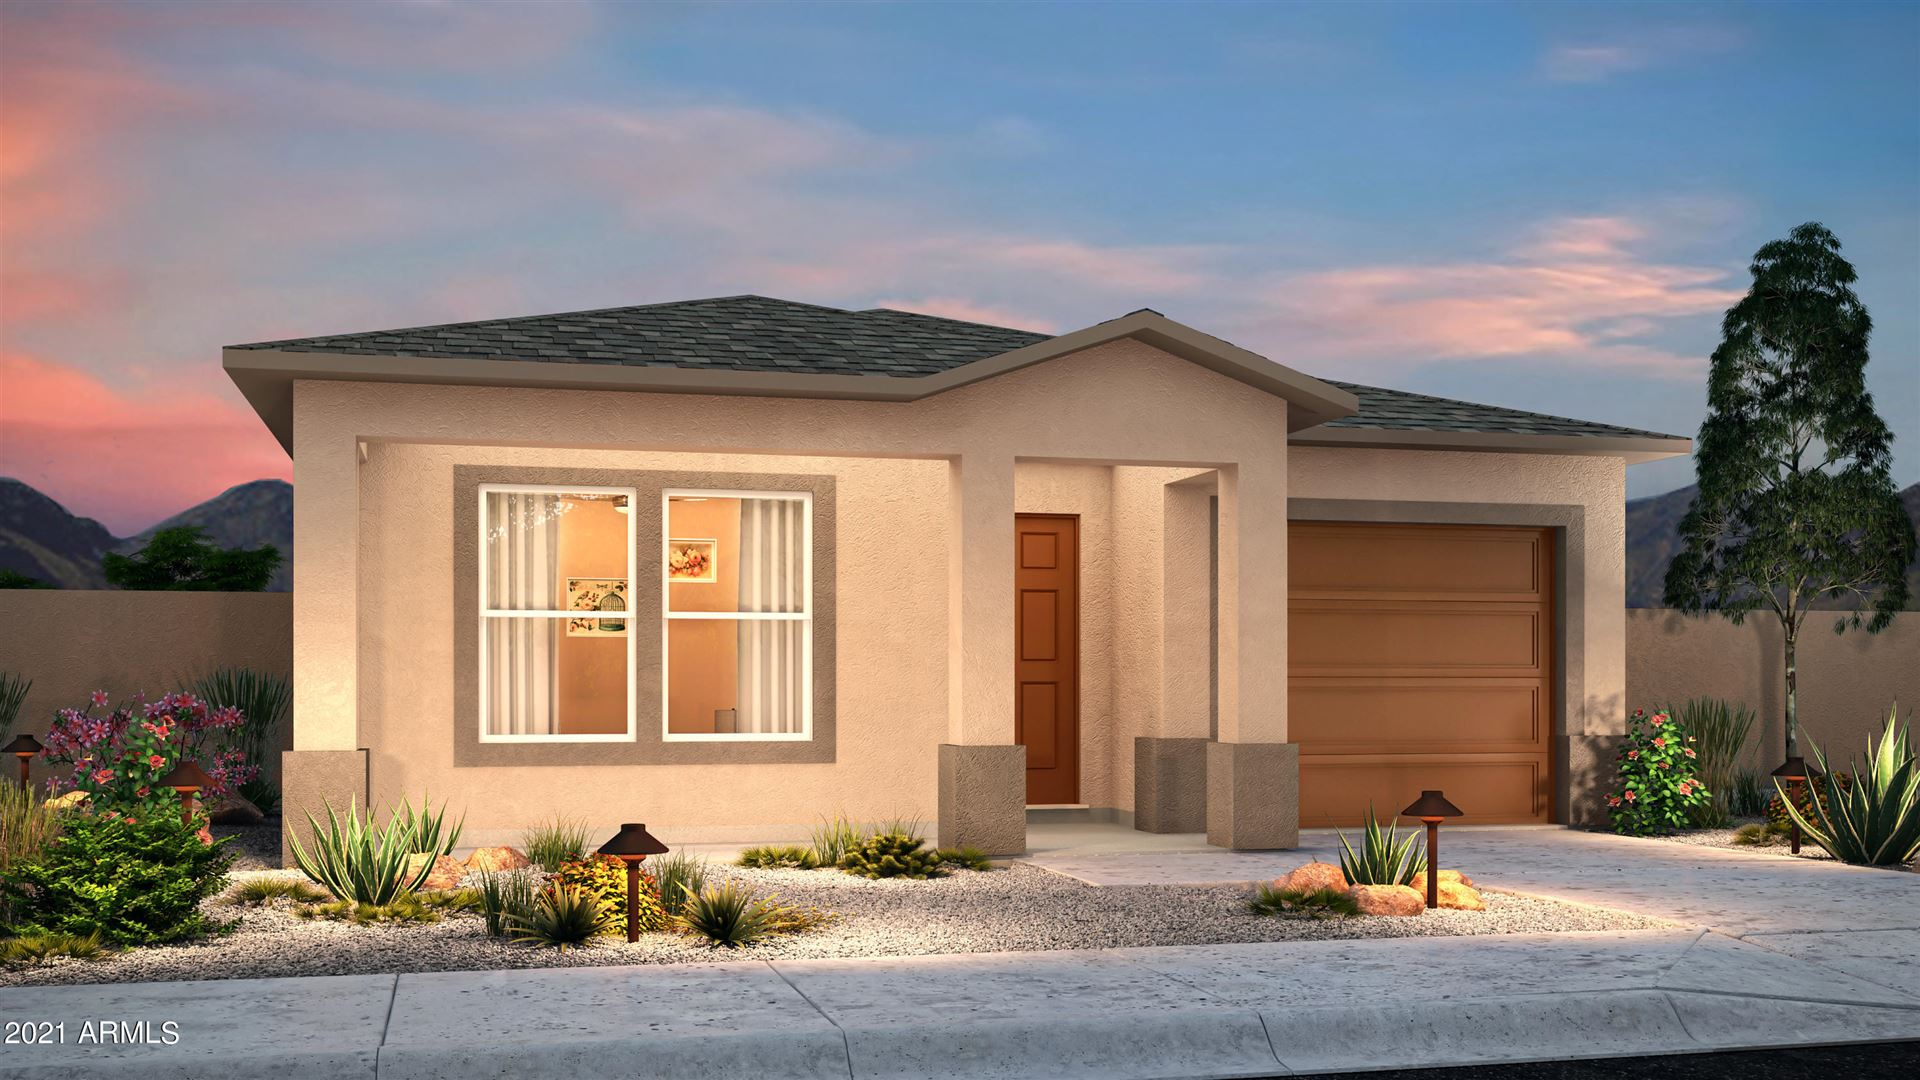 Photo of 183 ARKIN Circle, Morristown, AZ 85342 (MLS # 6259281)